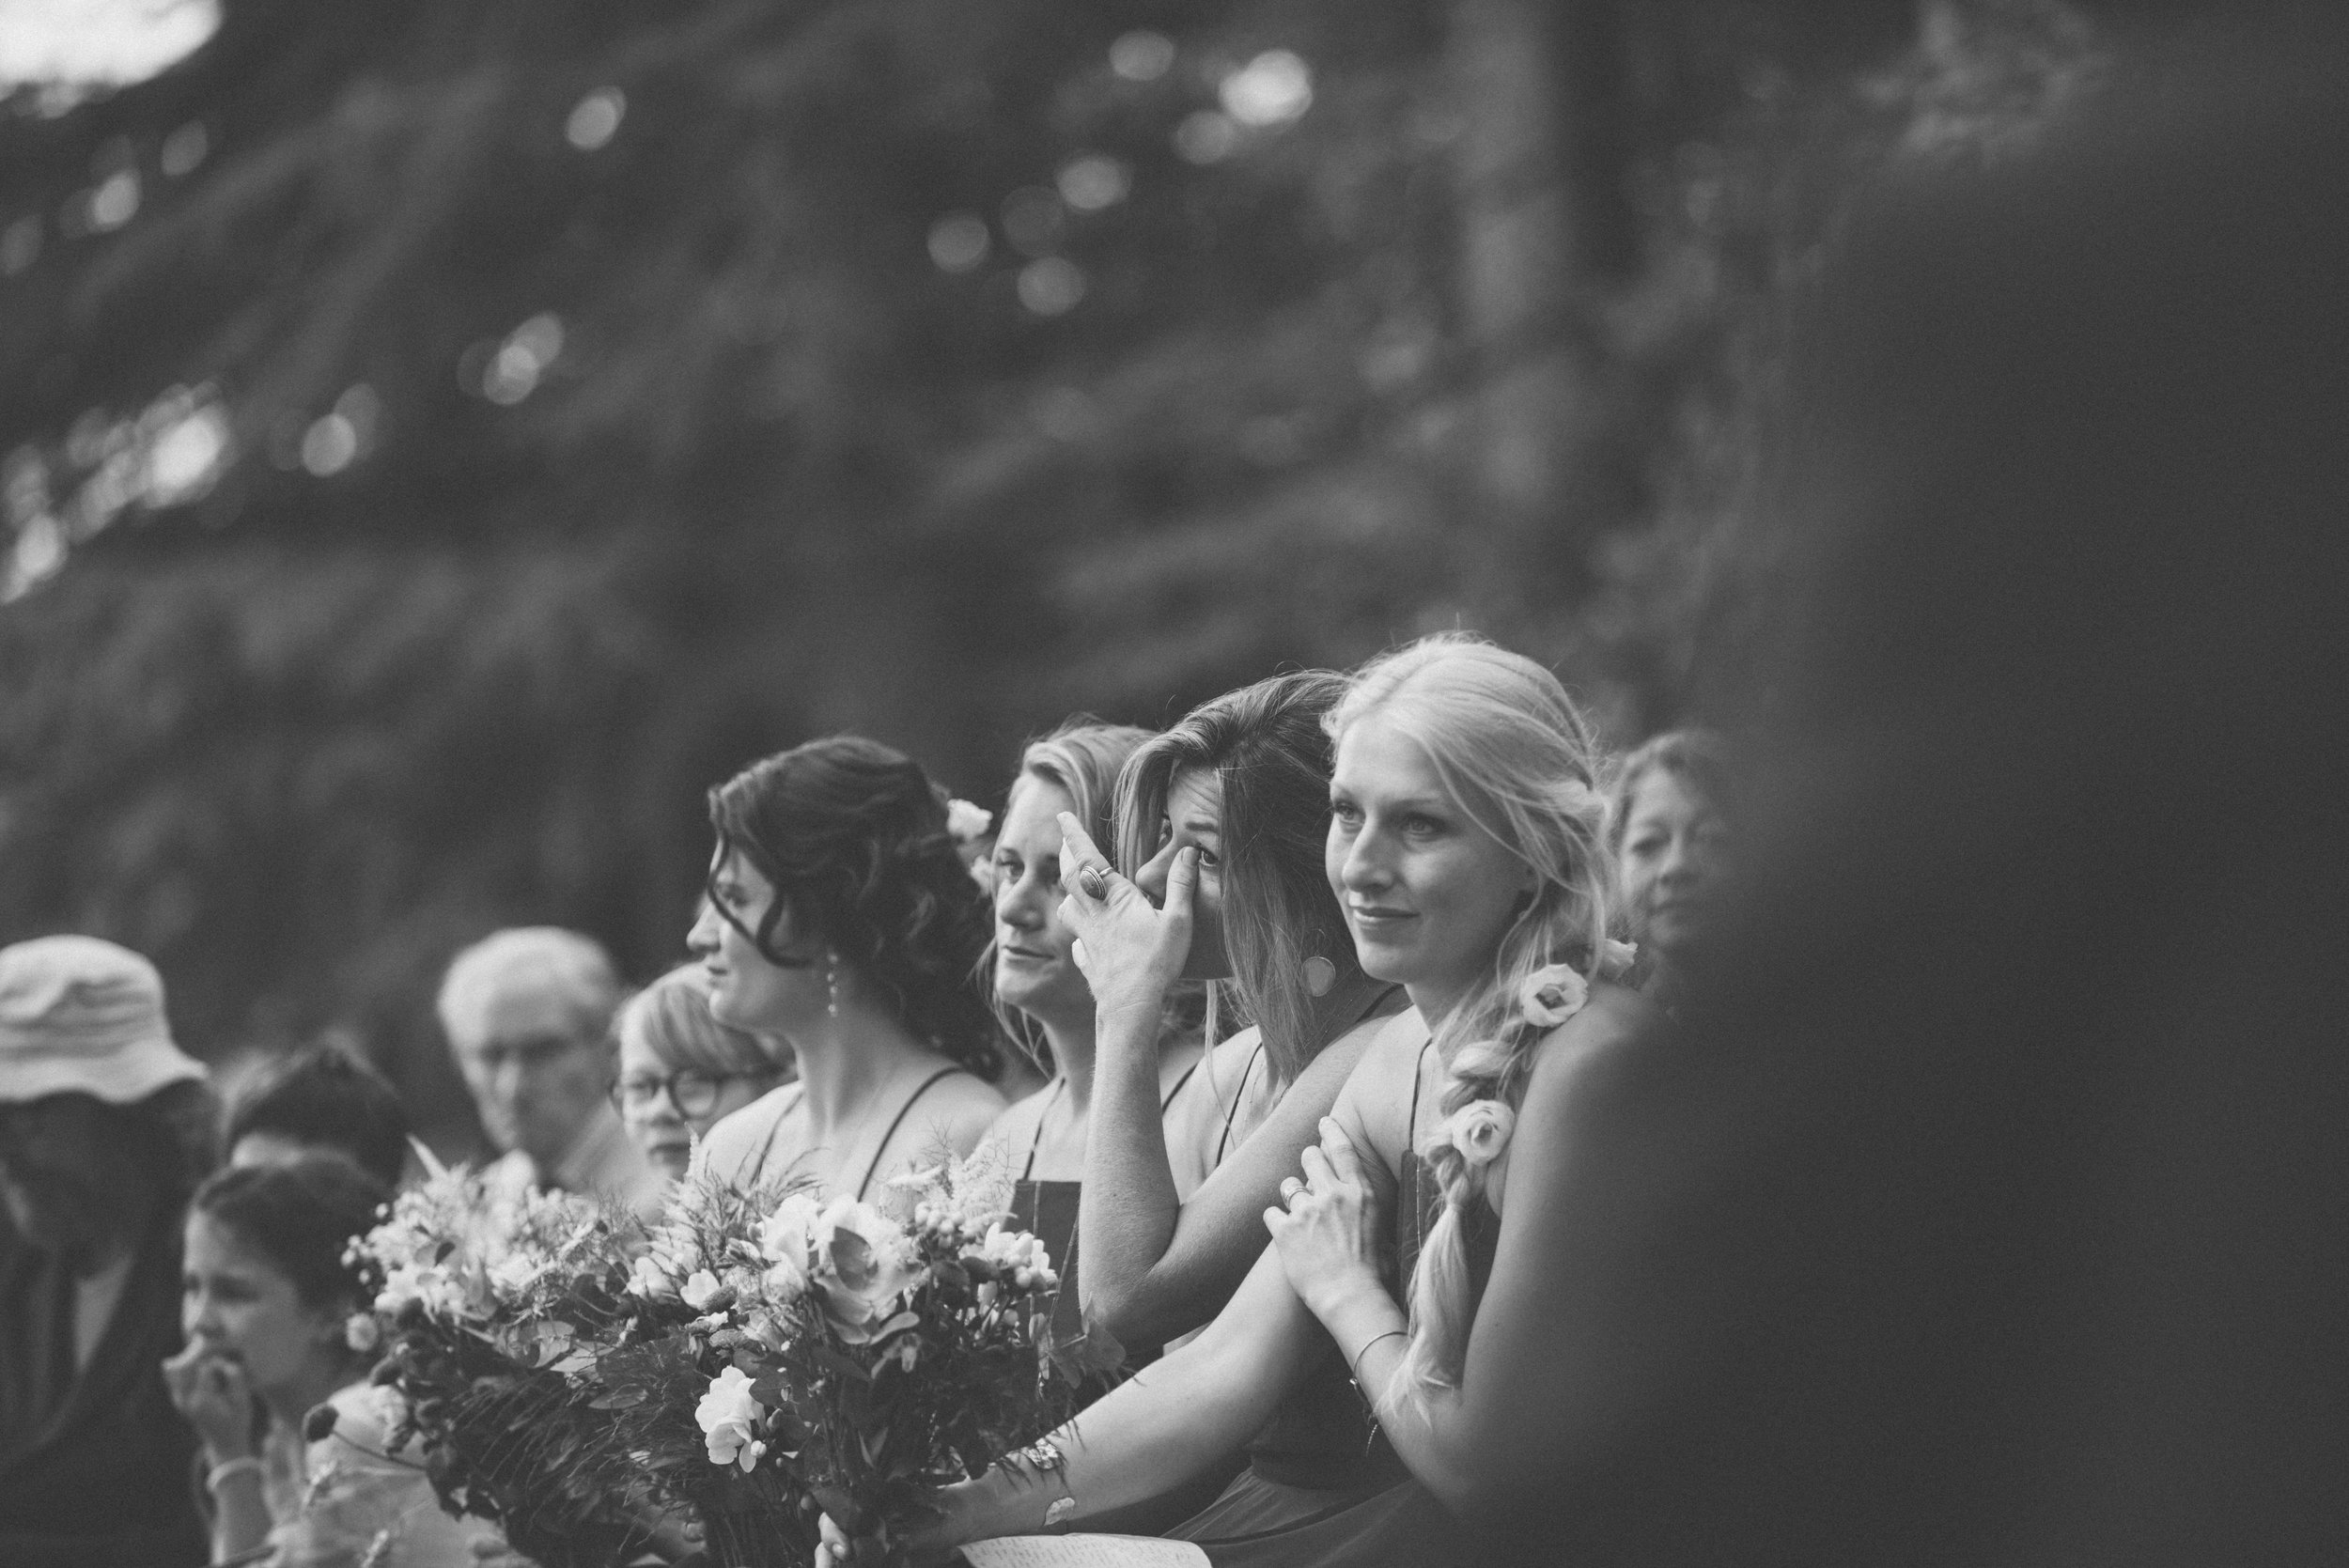 dordogne-wedding-photographer-mark-shaw-22.jpg